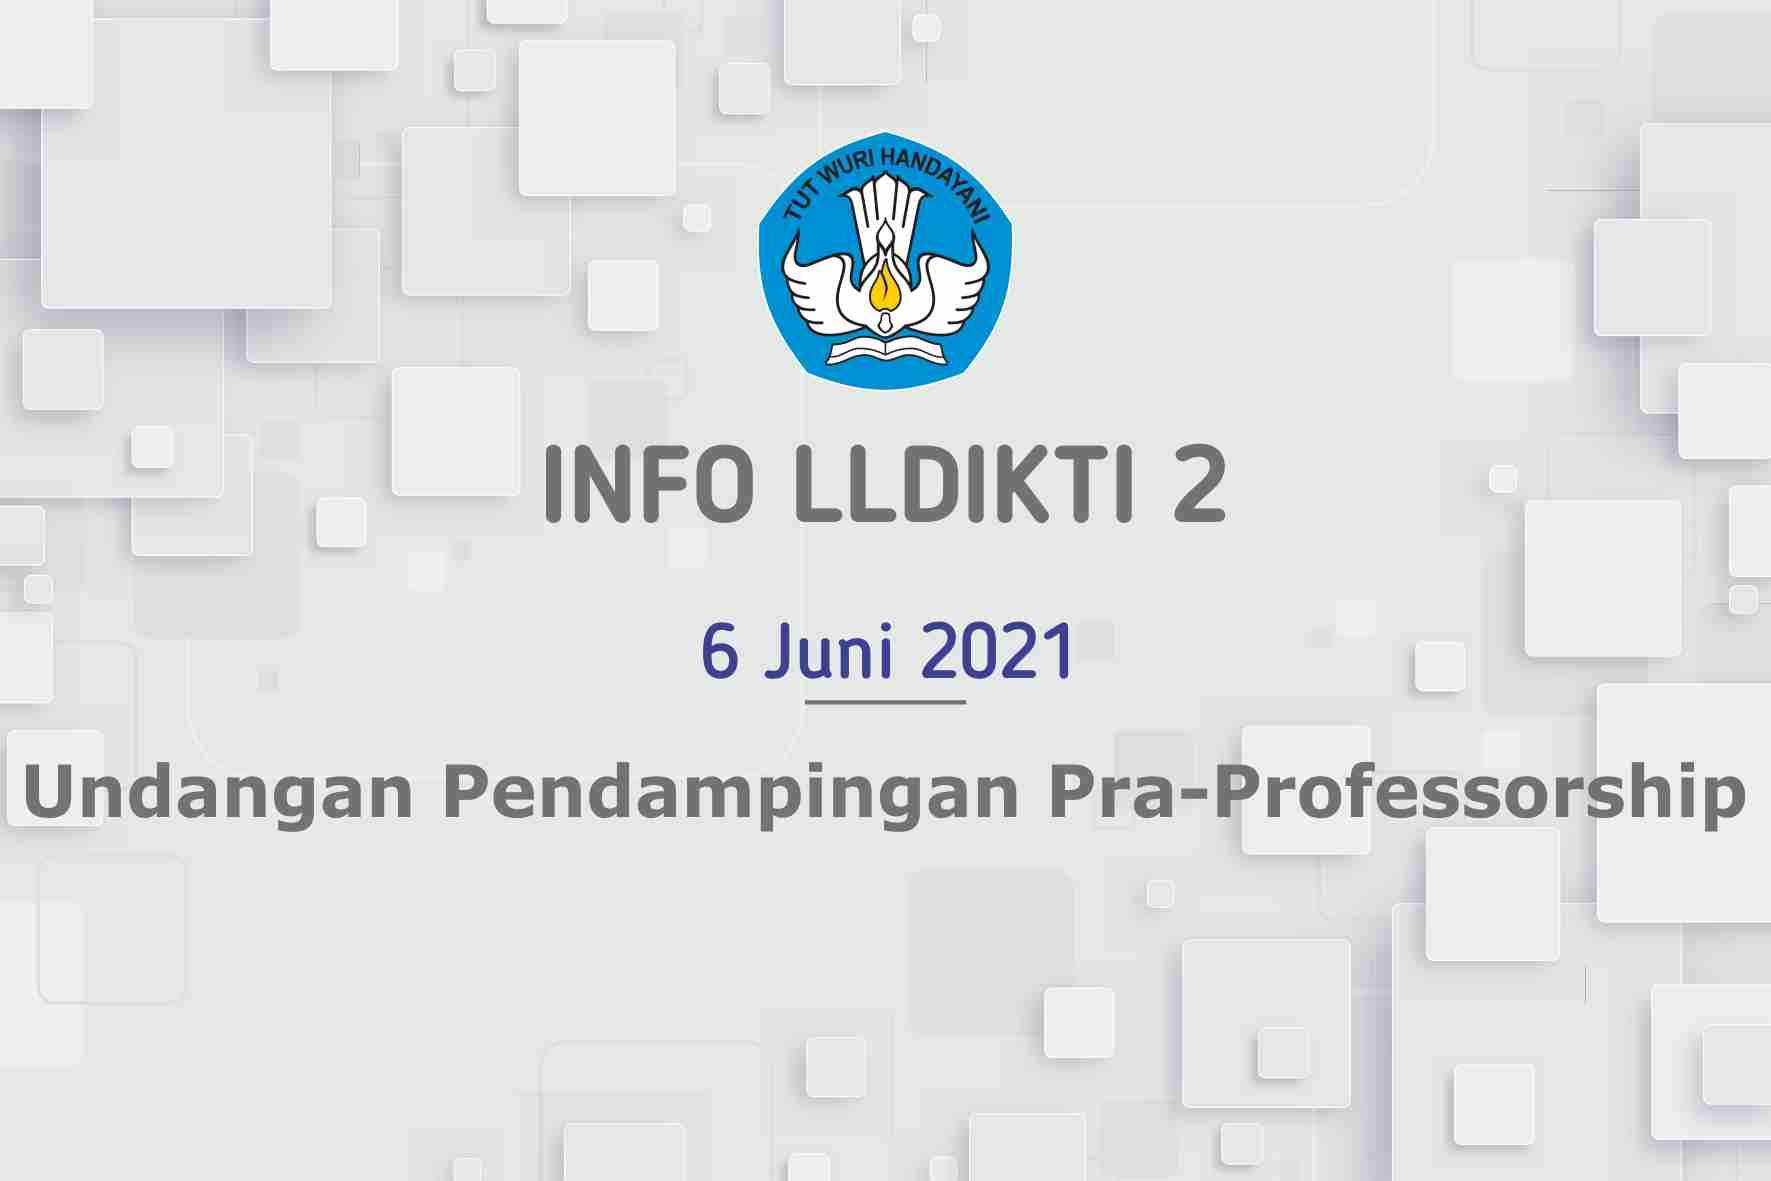 Undangan Pendampingan Pra-Professorship